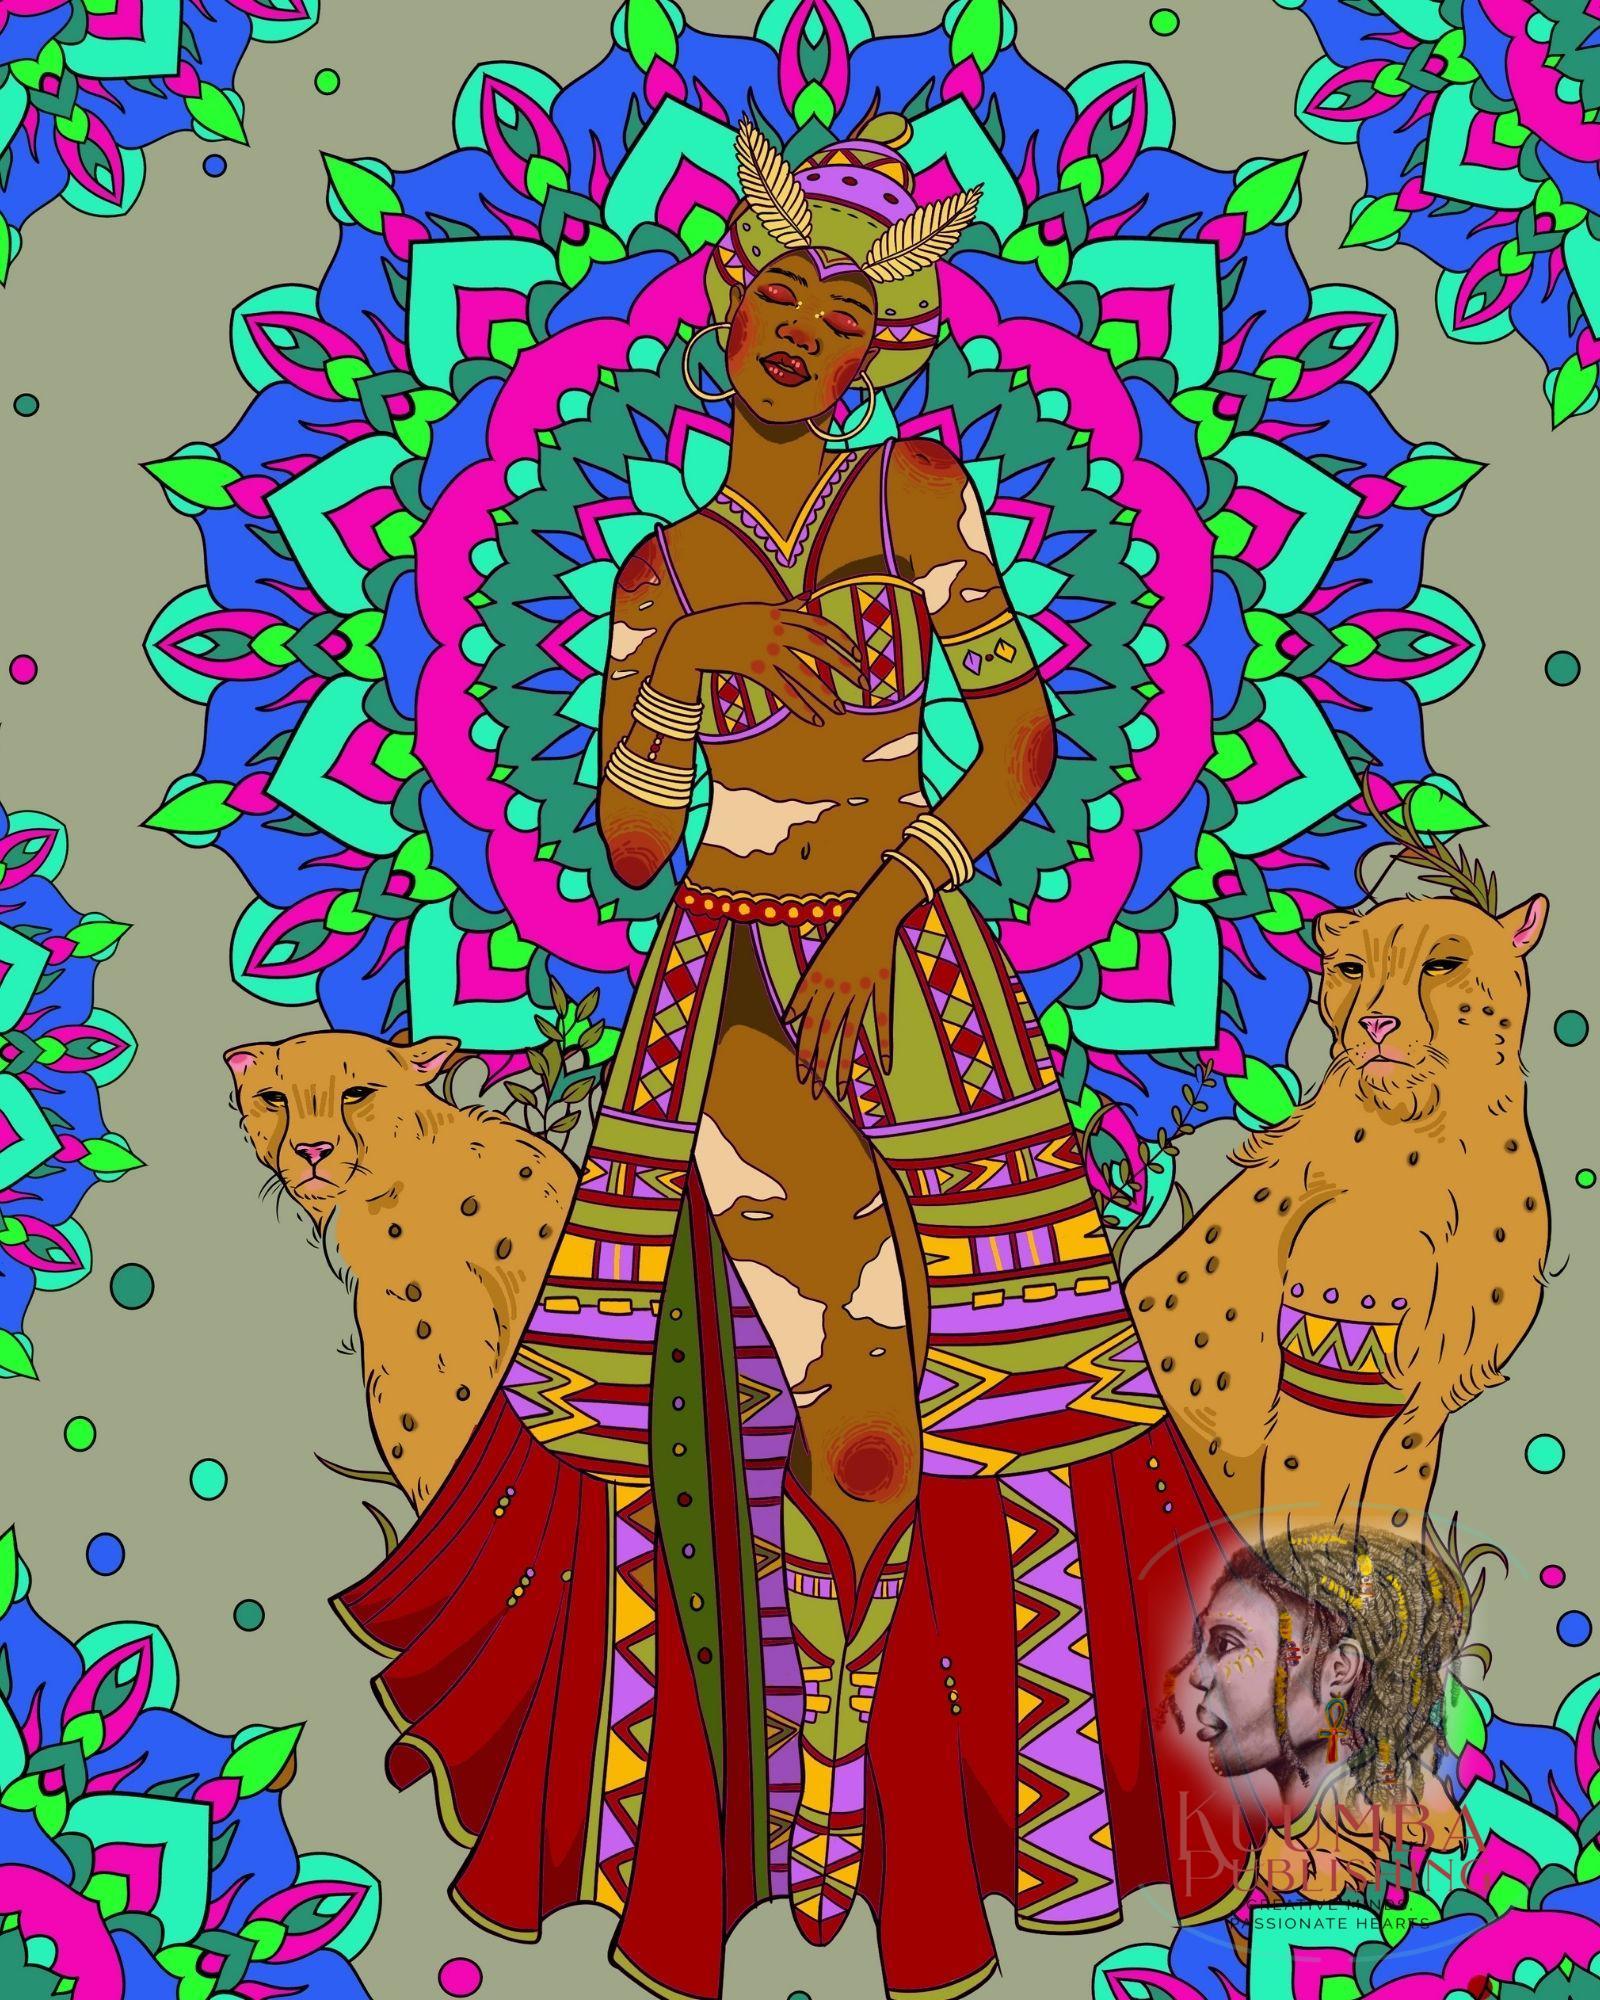 Goddess Mafdet Concept Art by Black woman author ND Jones